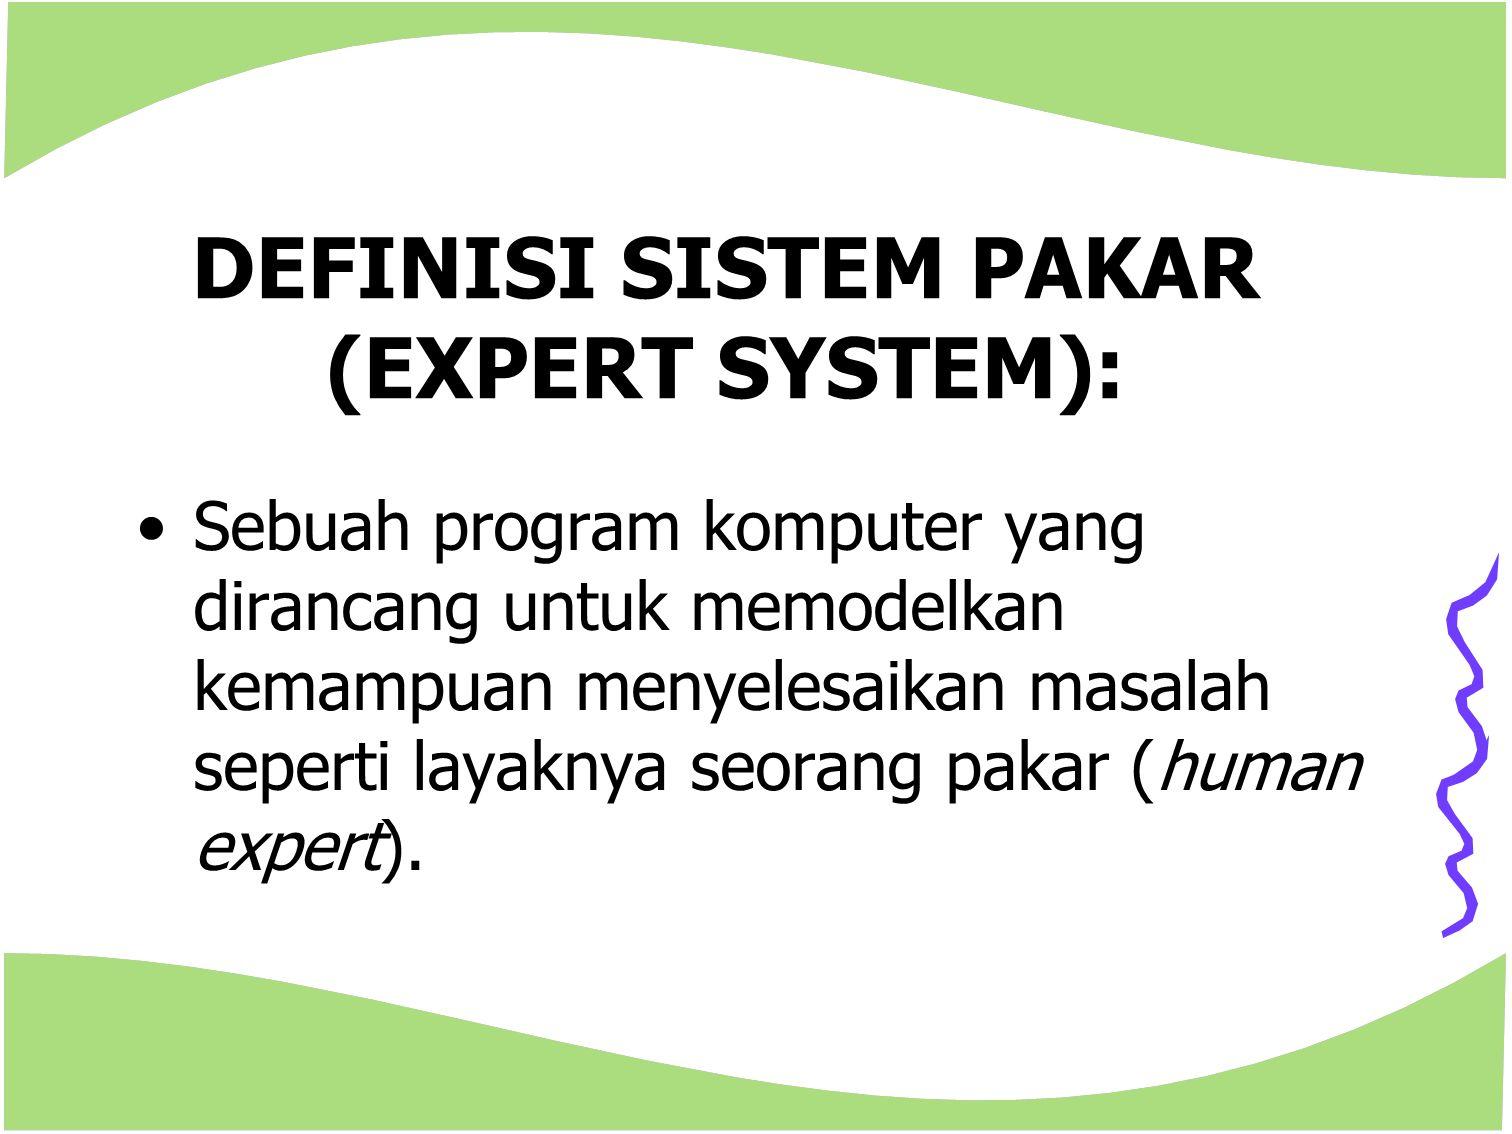 DEFINISI SISTEM PAKAR (EXPERT SYSTEM): Sebuah program komputer yang dirancang untuk memodelkan kemampuan menyelesaikan masalah seperti layaknya seoran